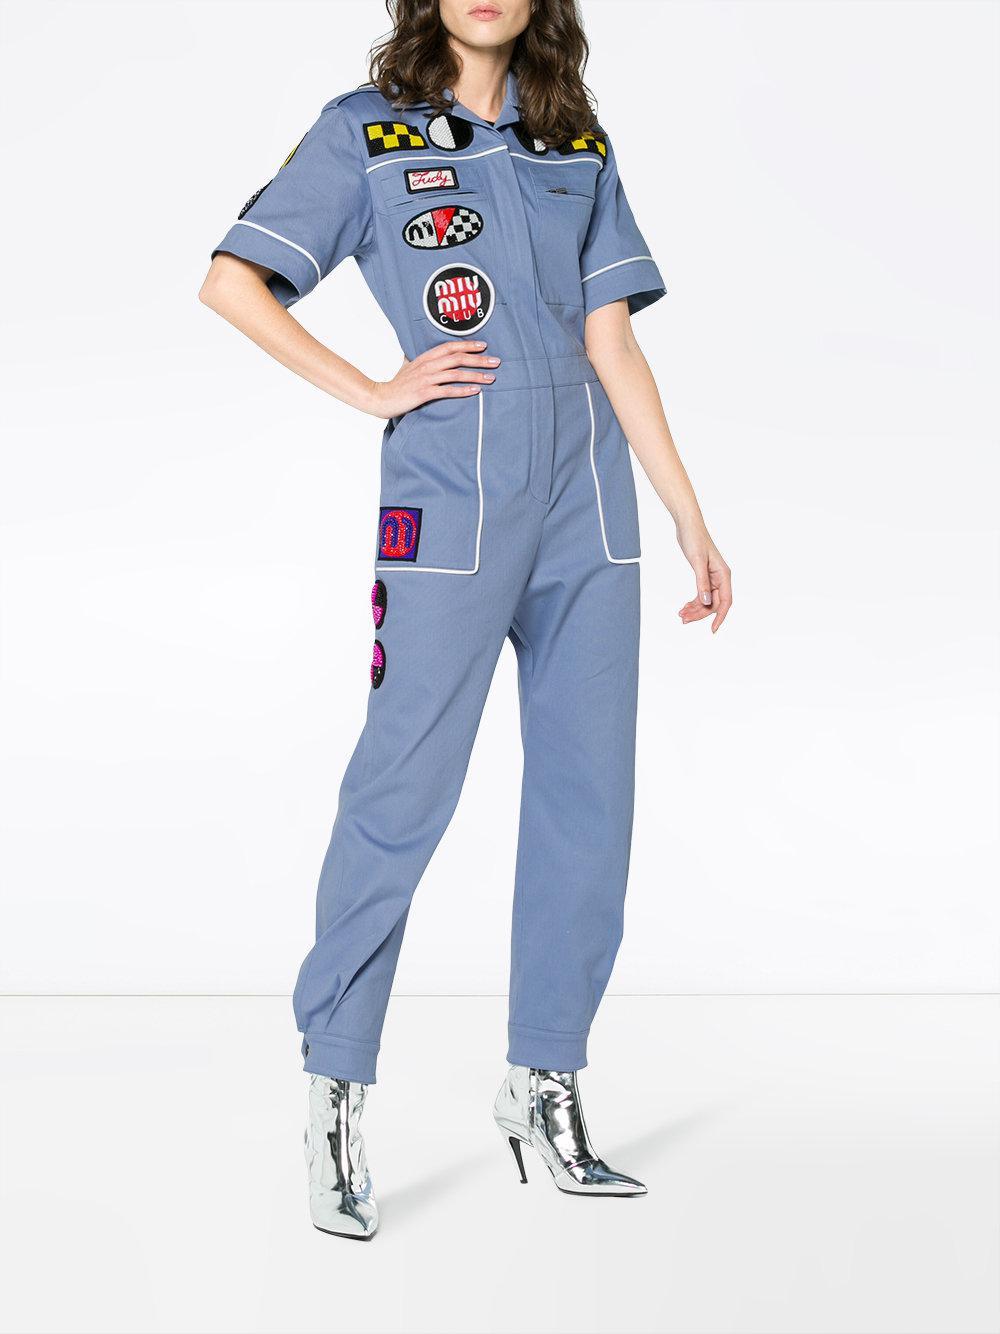 Blue Denim Mechanic Jumpsuit Miu Miu Cheap Sale Footaction SgDaSo